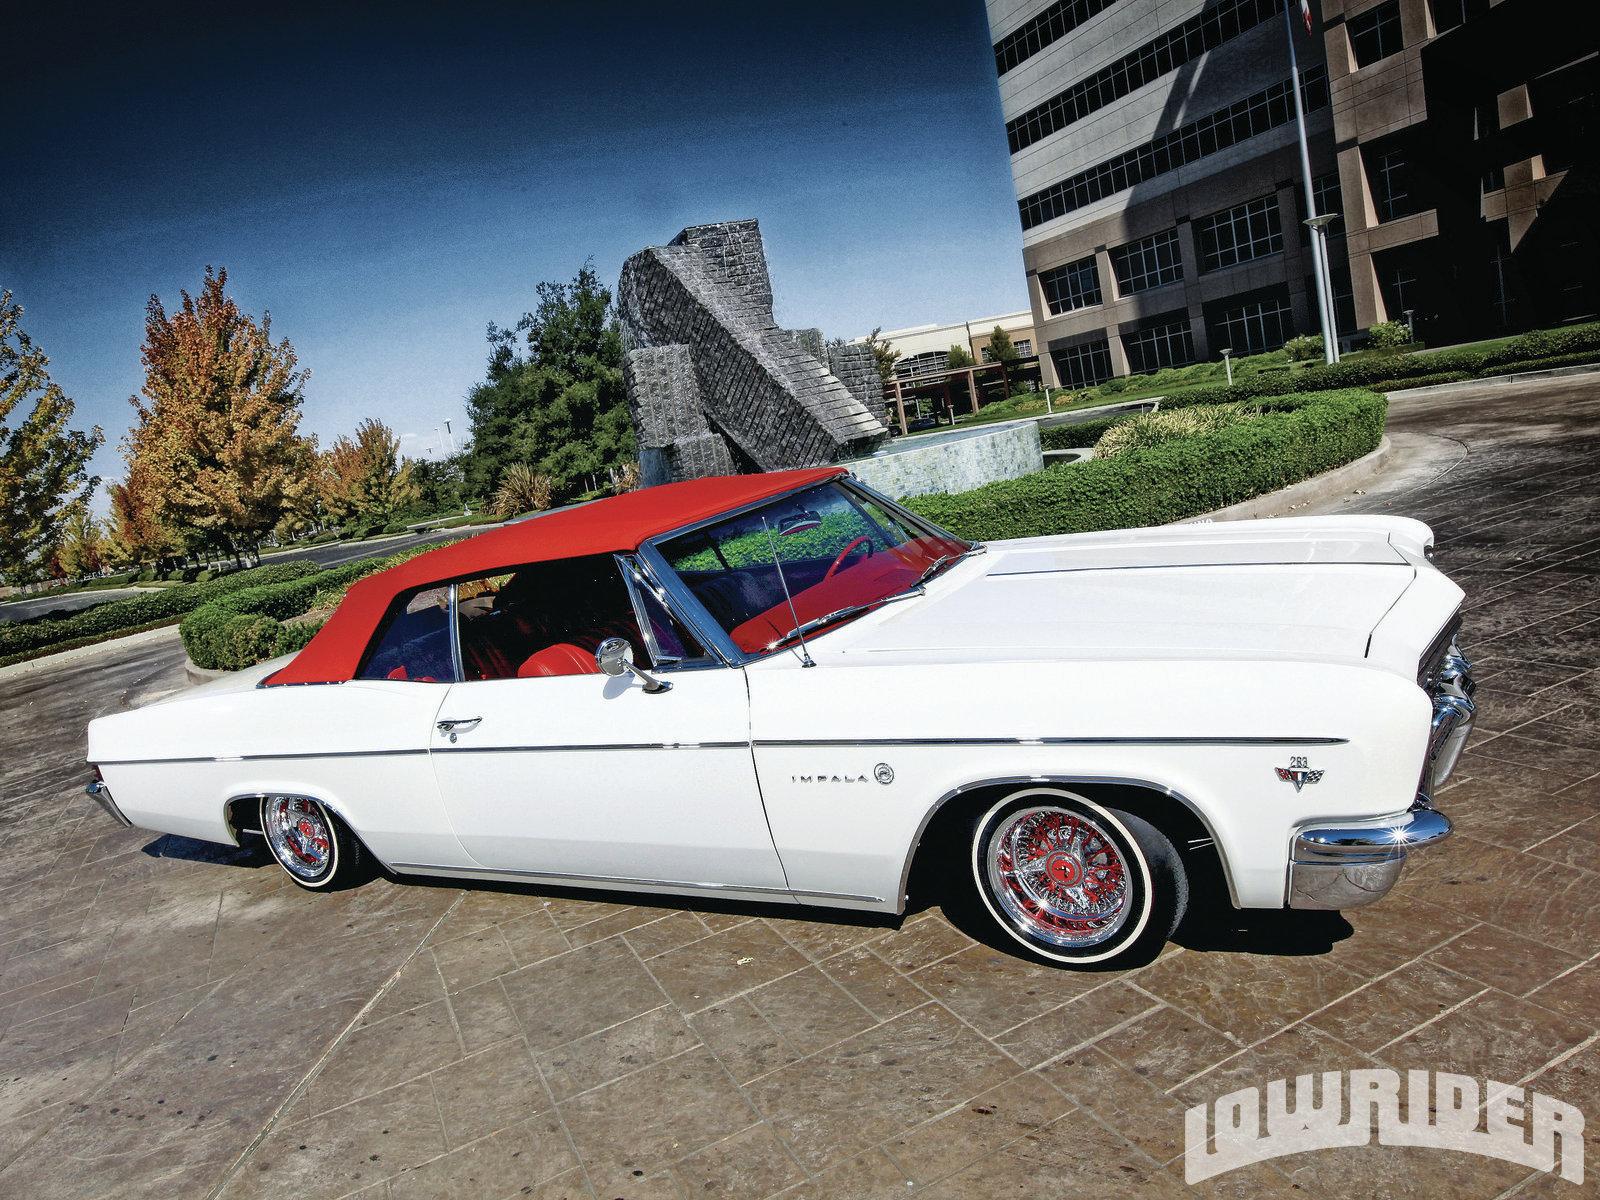 1966 Chevrolet Impala Convertible - Lowrider Magazine